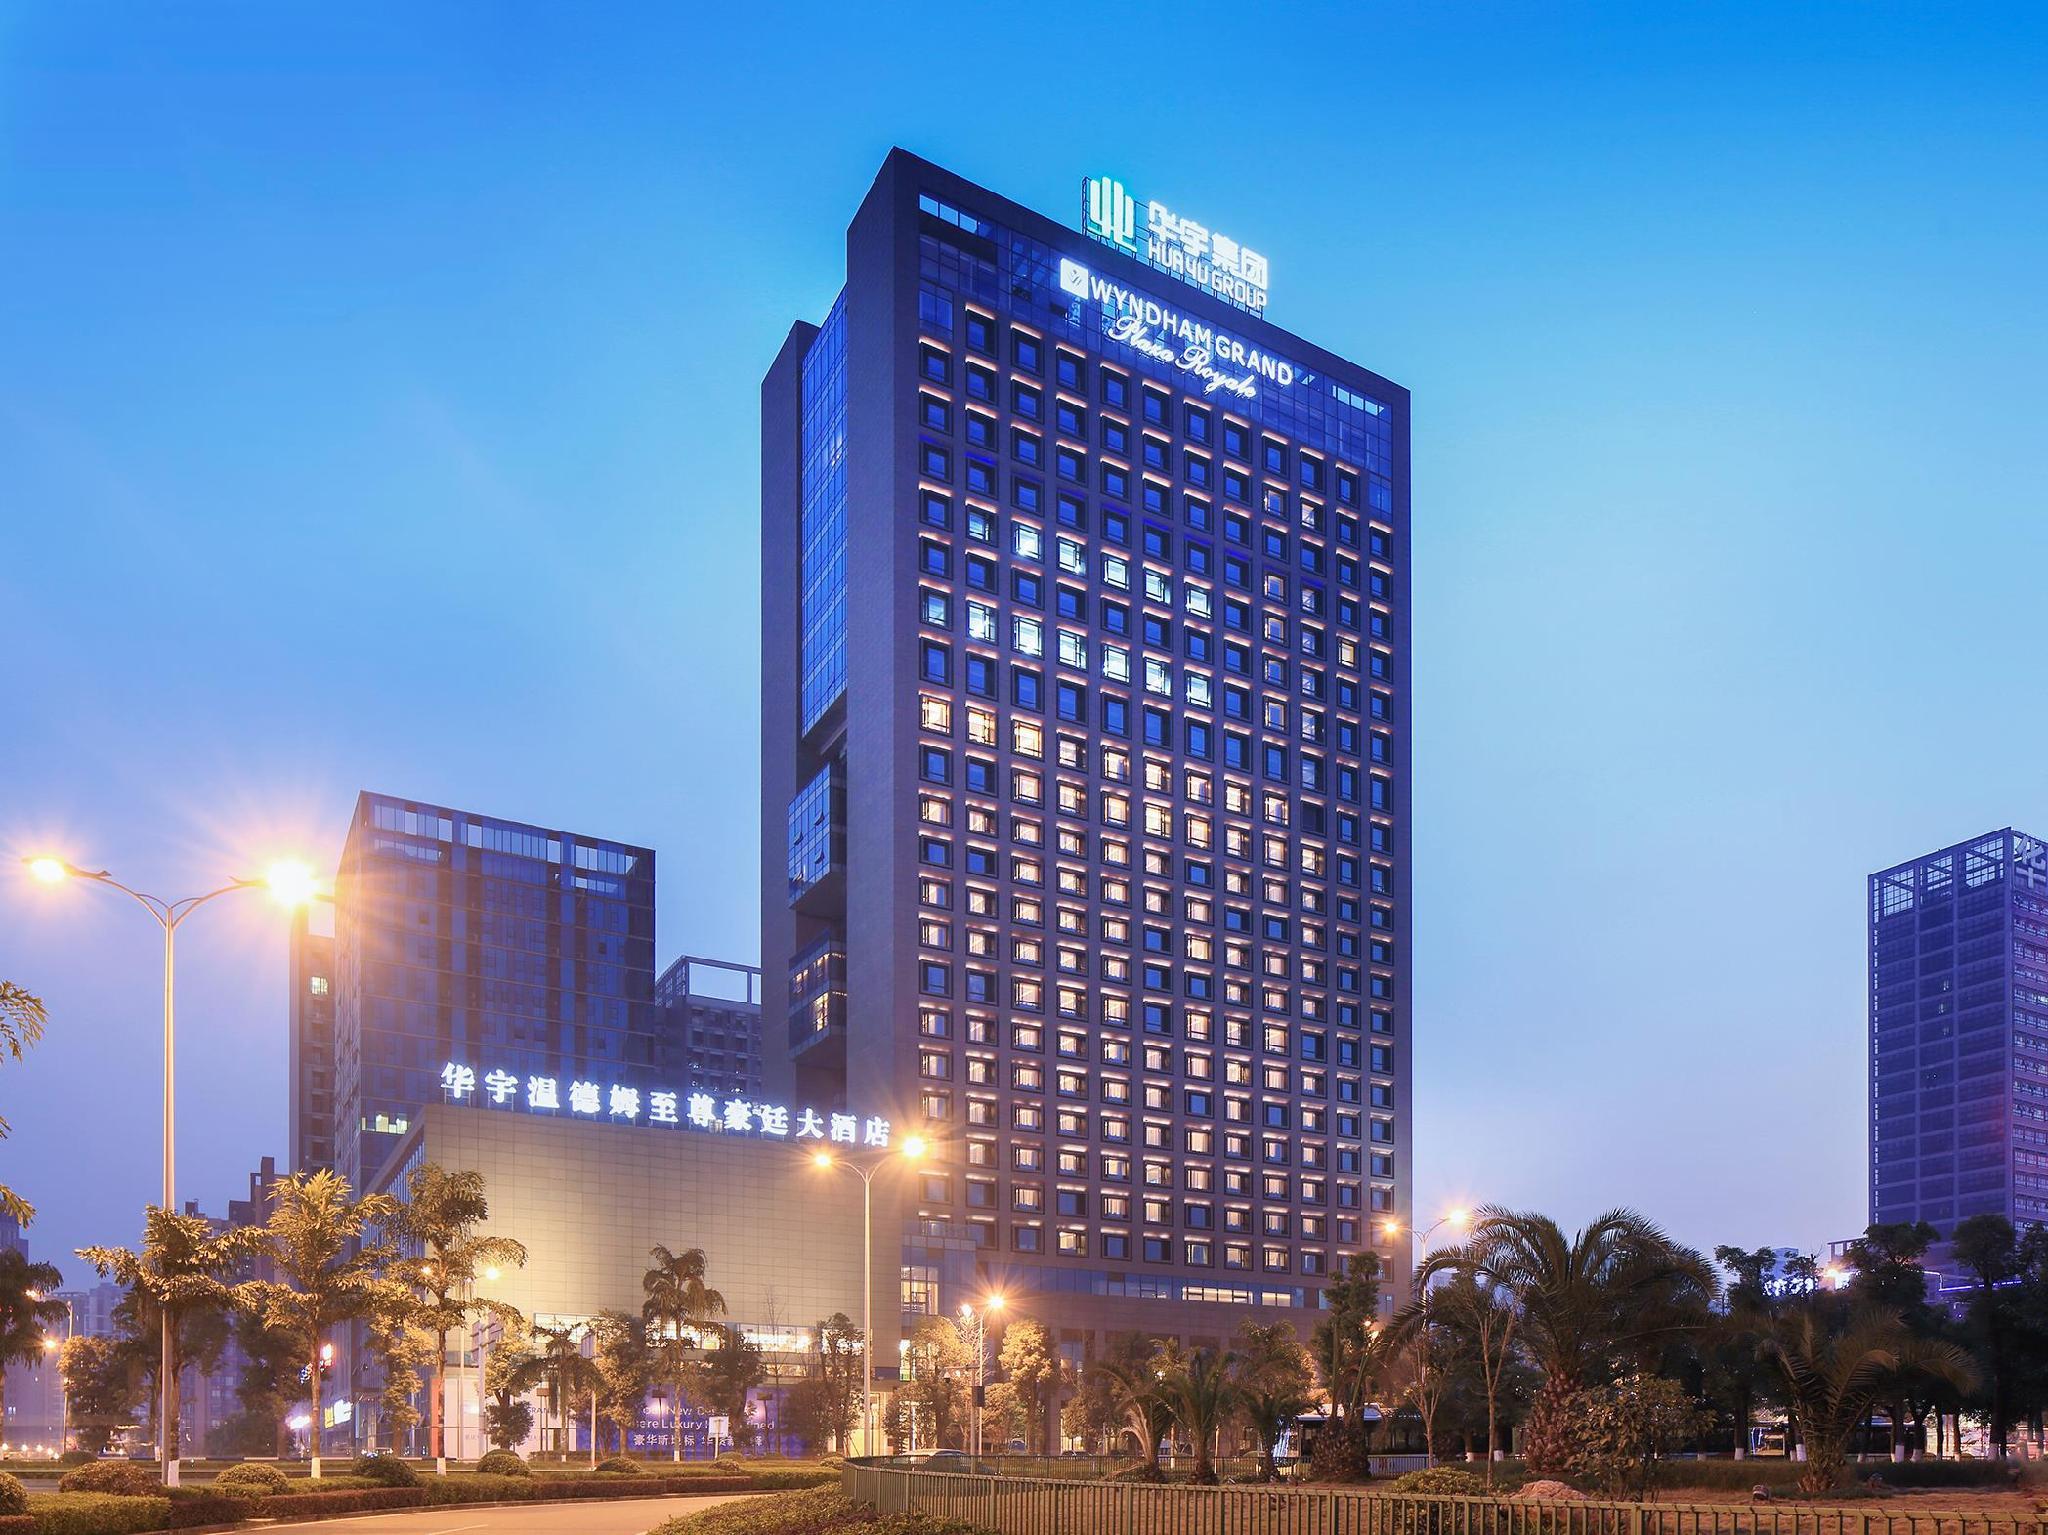 Wyndham Grand Plaza Royale Huayu Chongqing